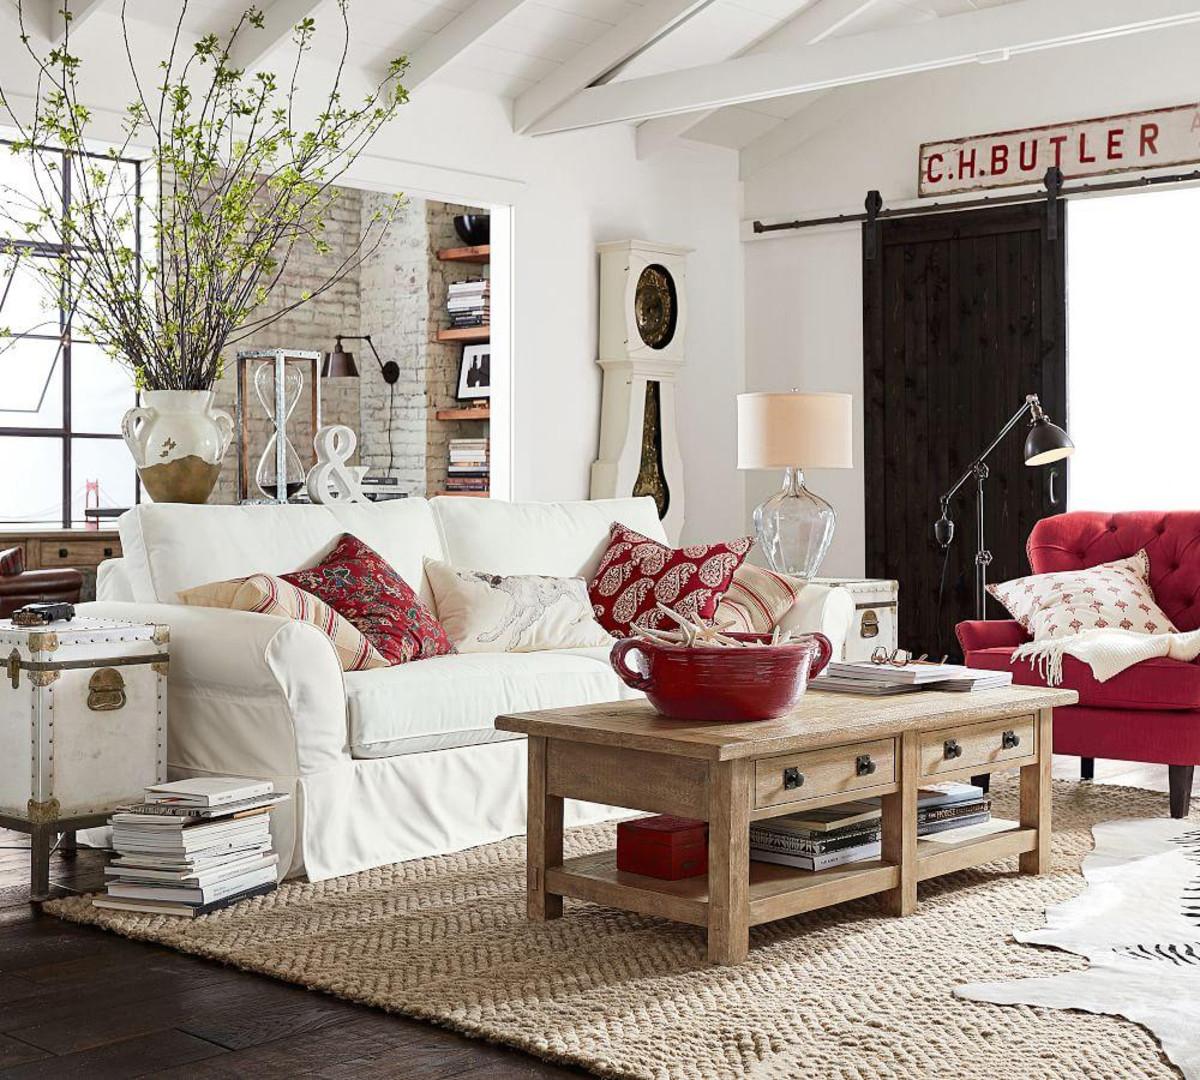 Rustic Decorating Ideas | Modern Rustic & Farmhouse Industrial on Farmhouse Decorating Ideas  id=53596